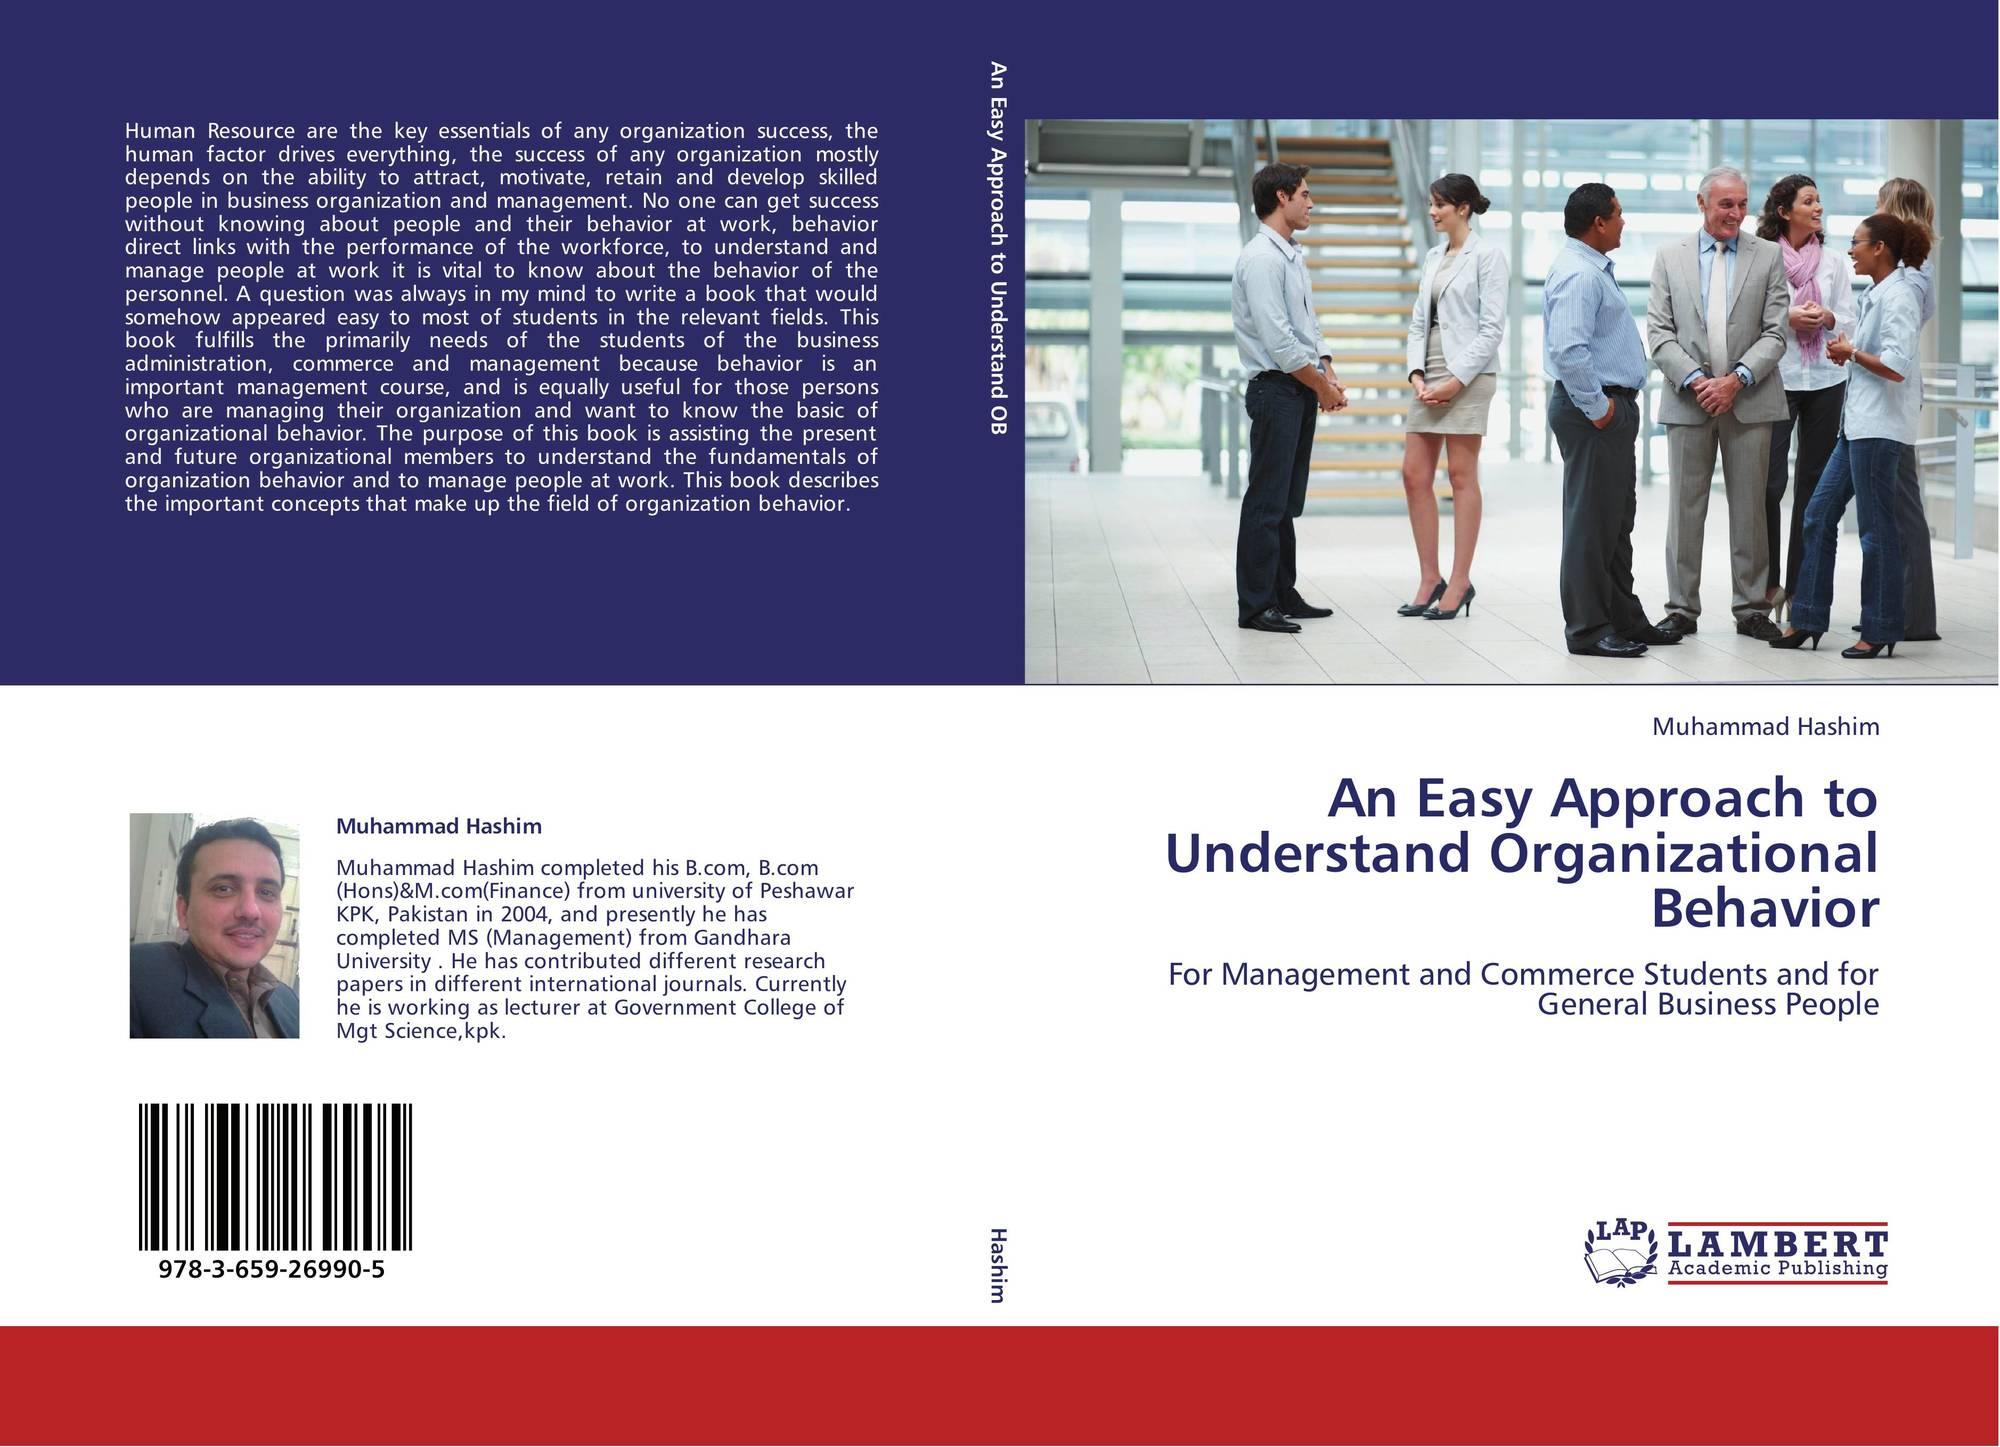 the importance understanding organizational behavior in an organization